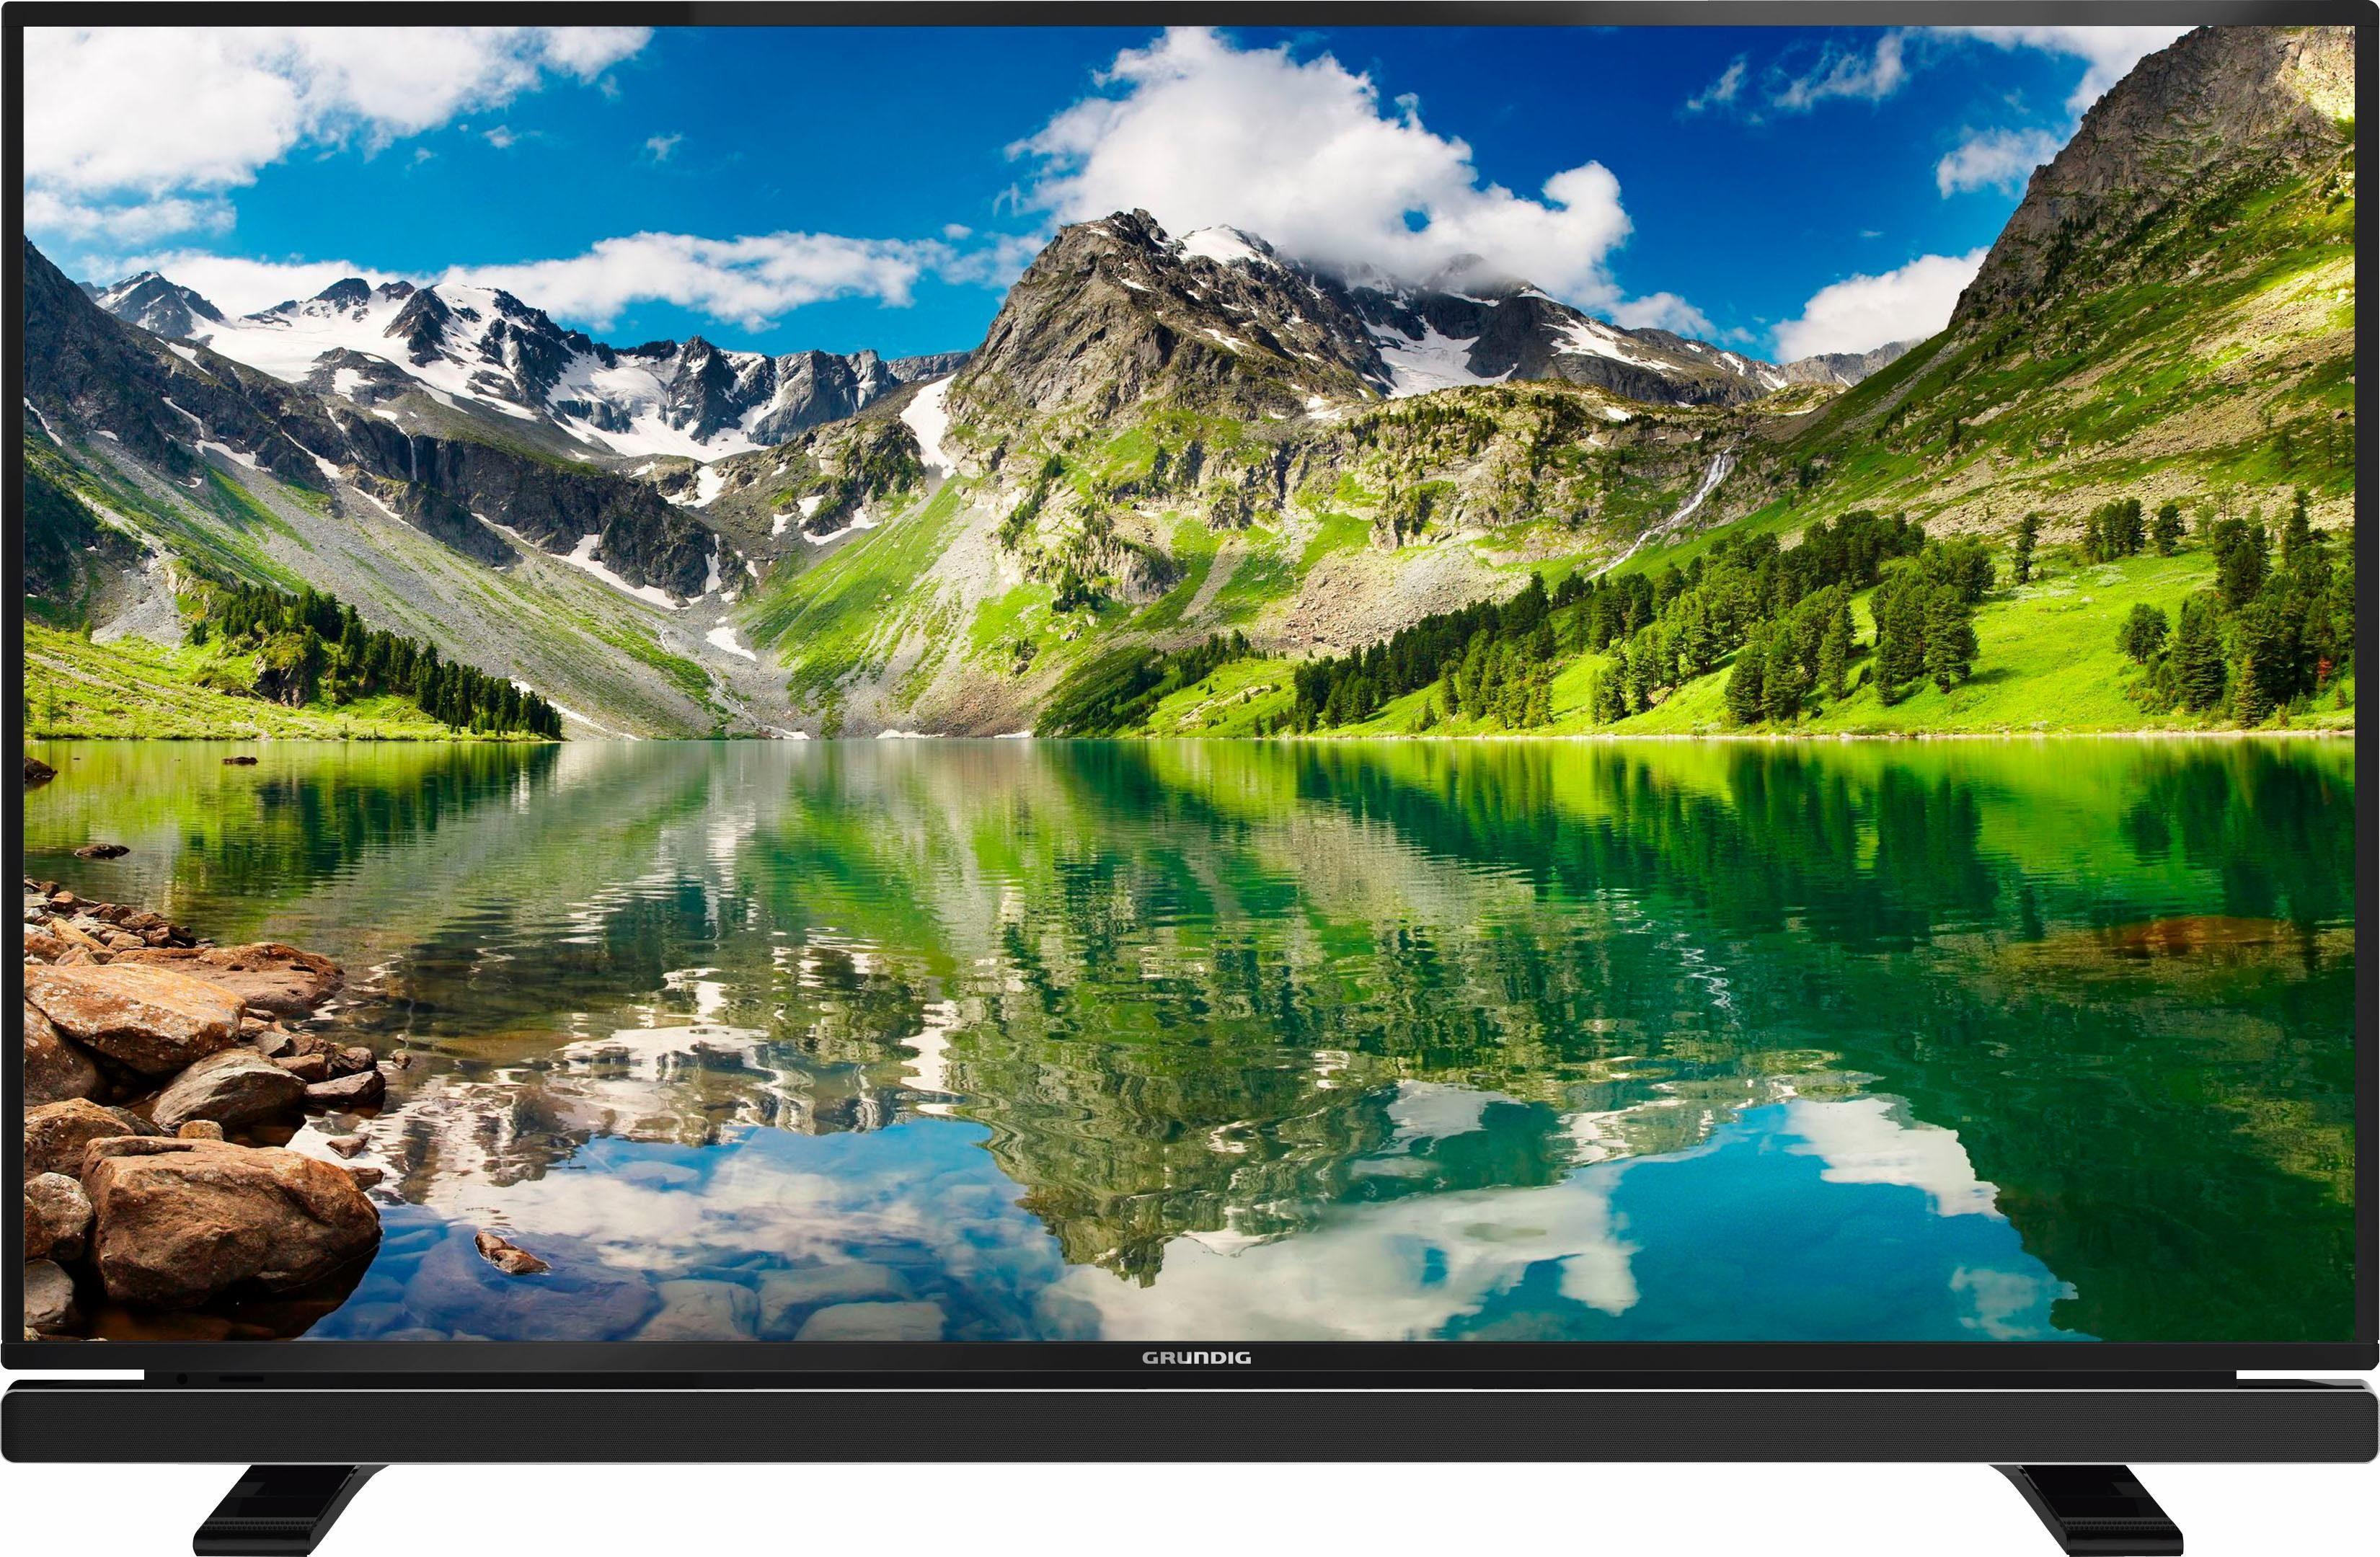 Grundig 32 VLE 500 BG LED Fernseher (80 cm/32 Zoll, HD)